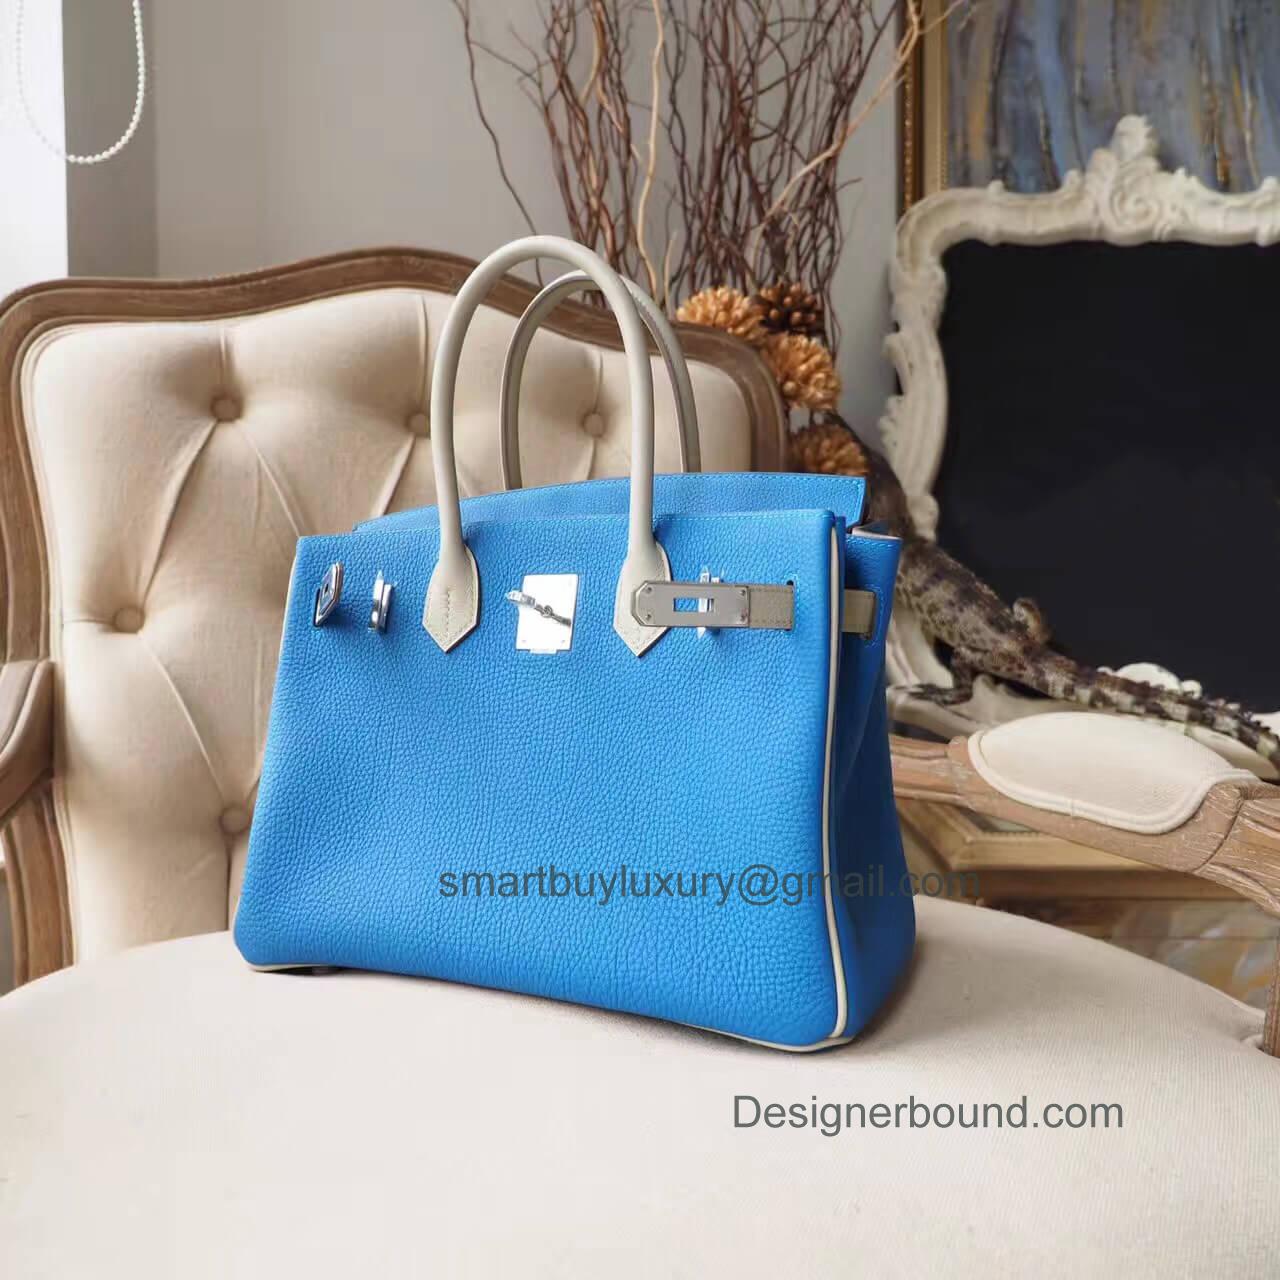 2c7f56046379 Hand Stitched Birkin 30 Bag in Bicolored ck76 Blue Indigo Shining ...